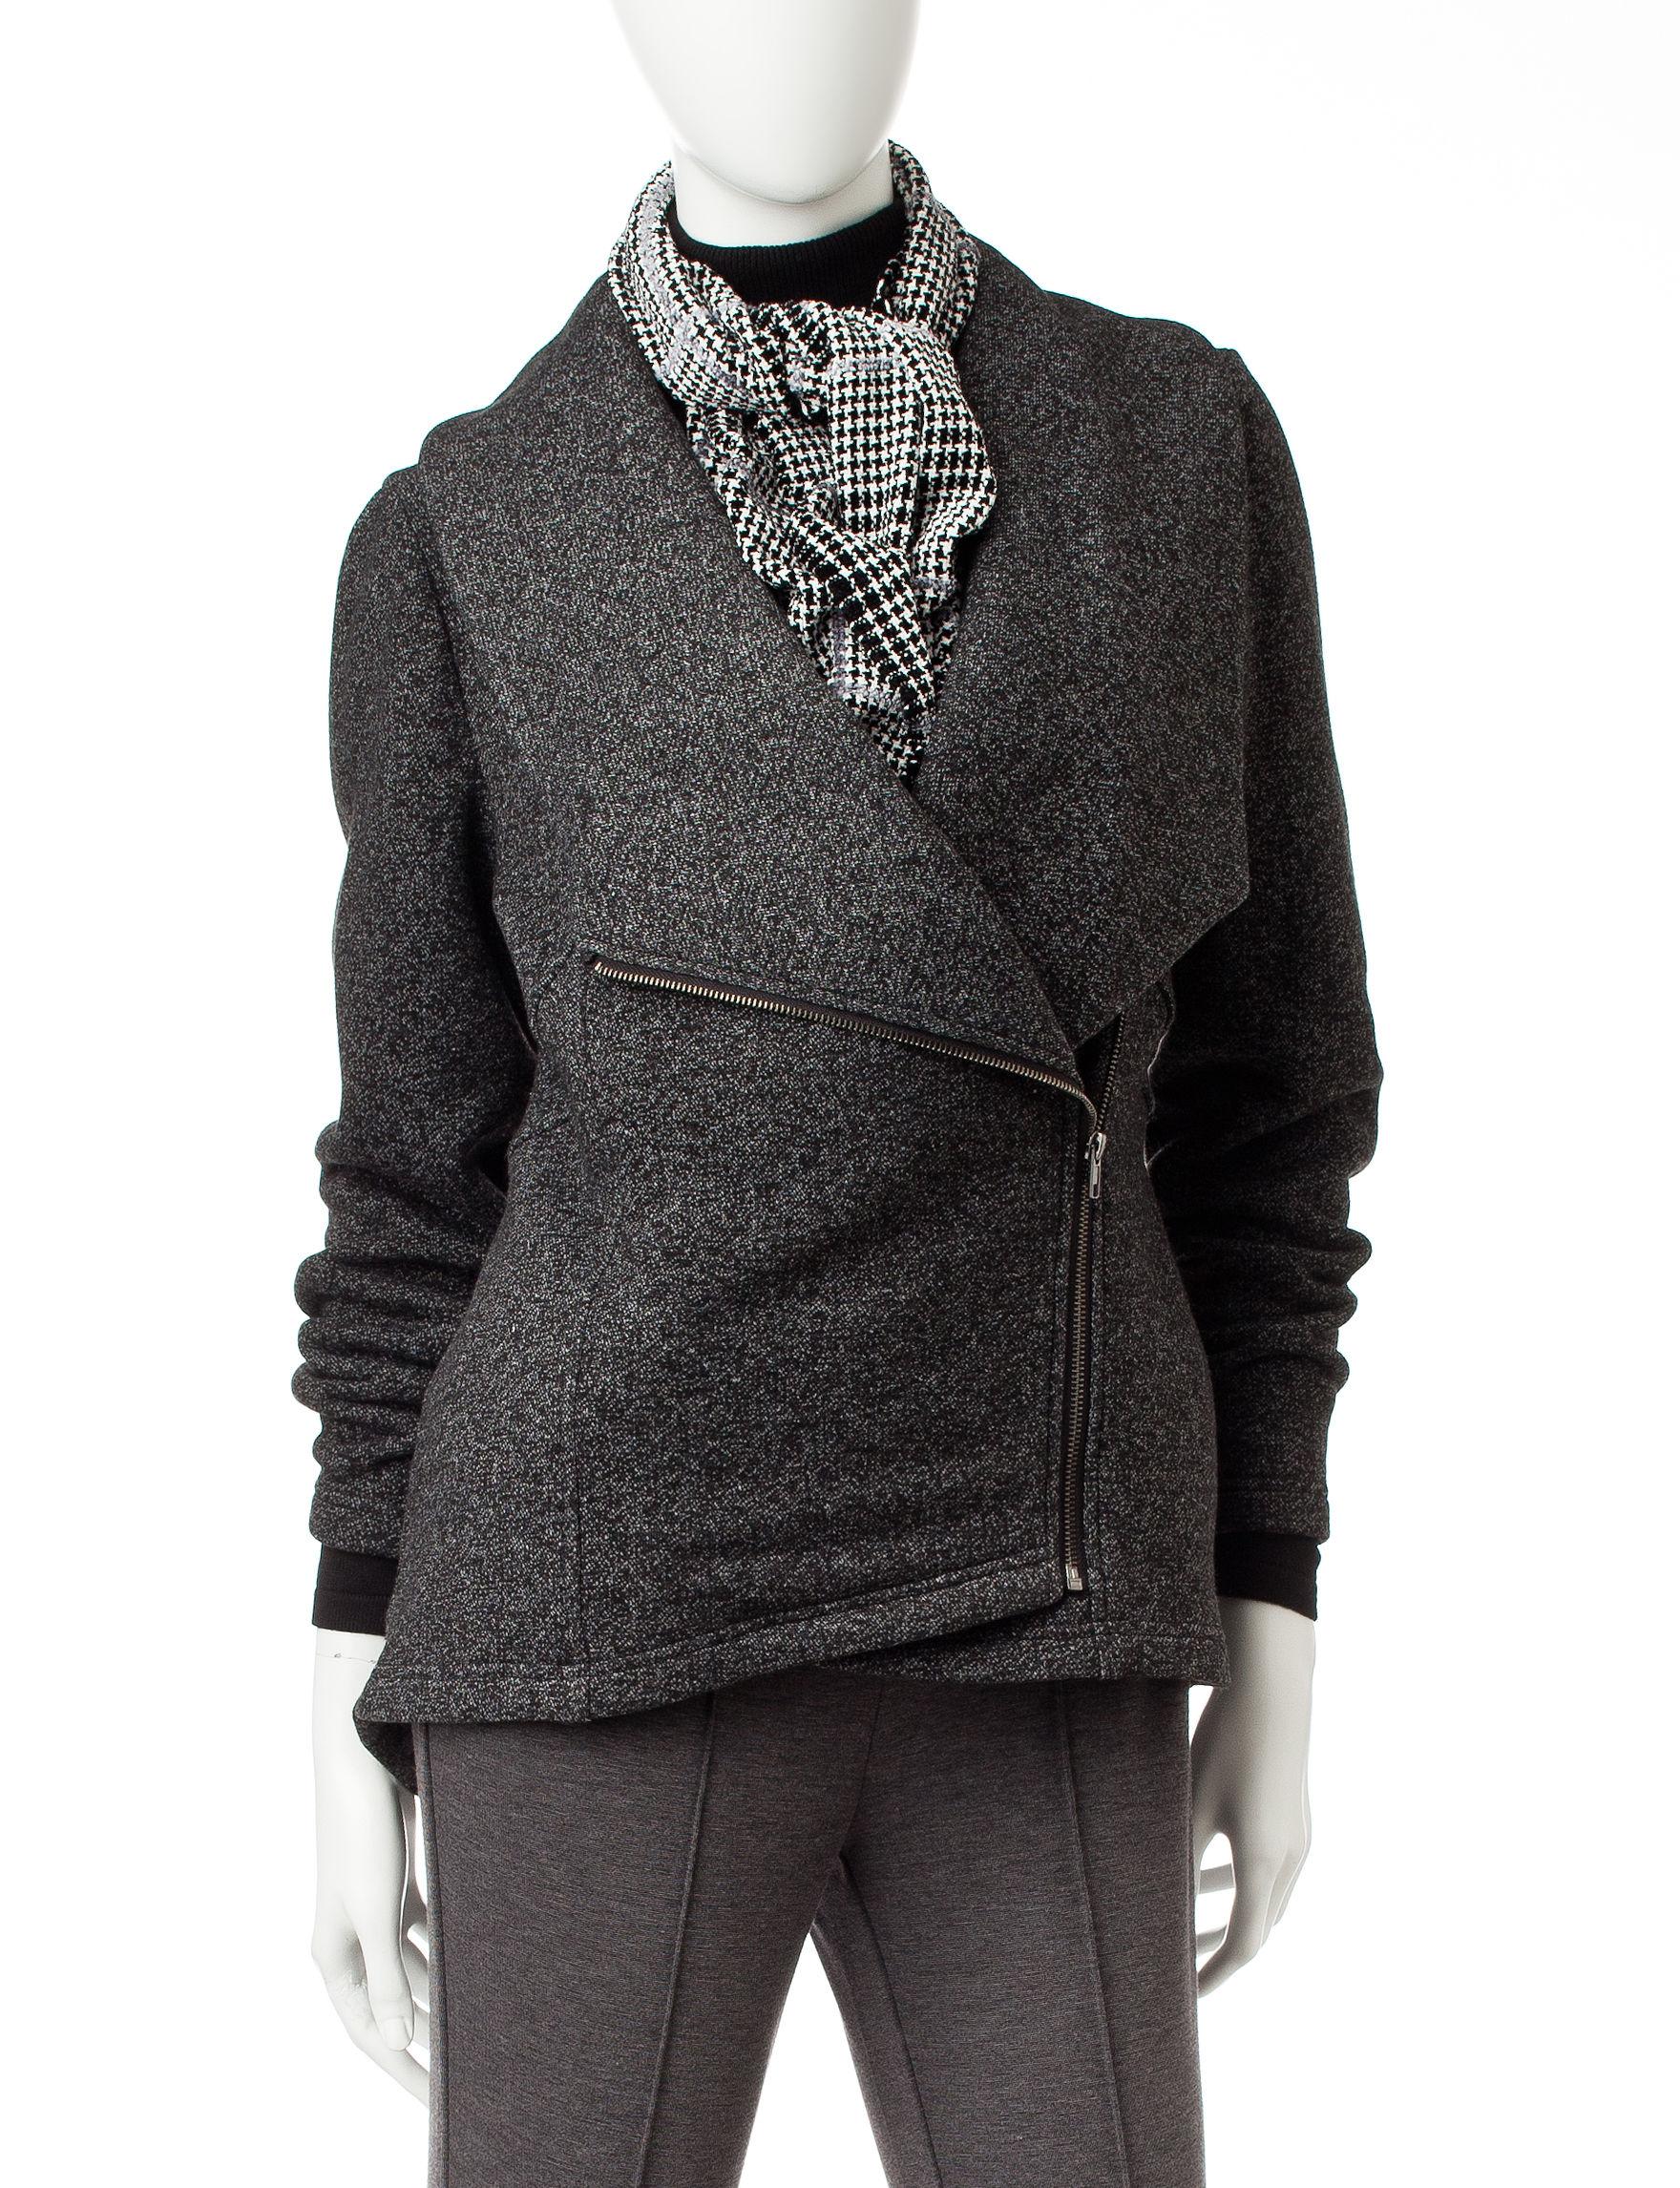 Signature Studio Black Peacoats & Overcoats